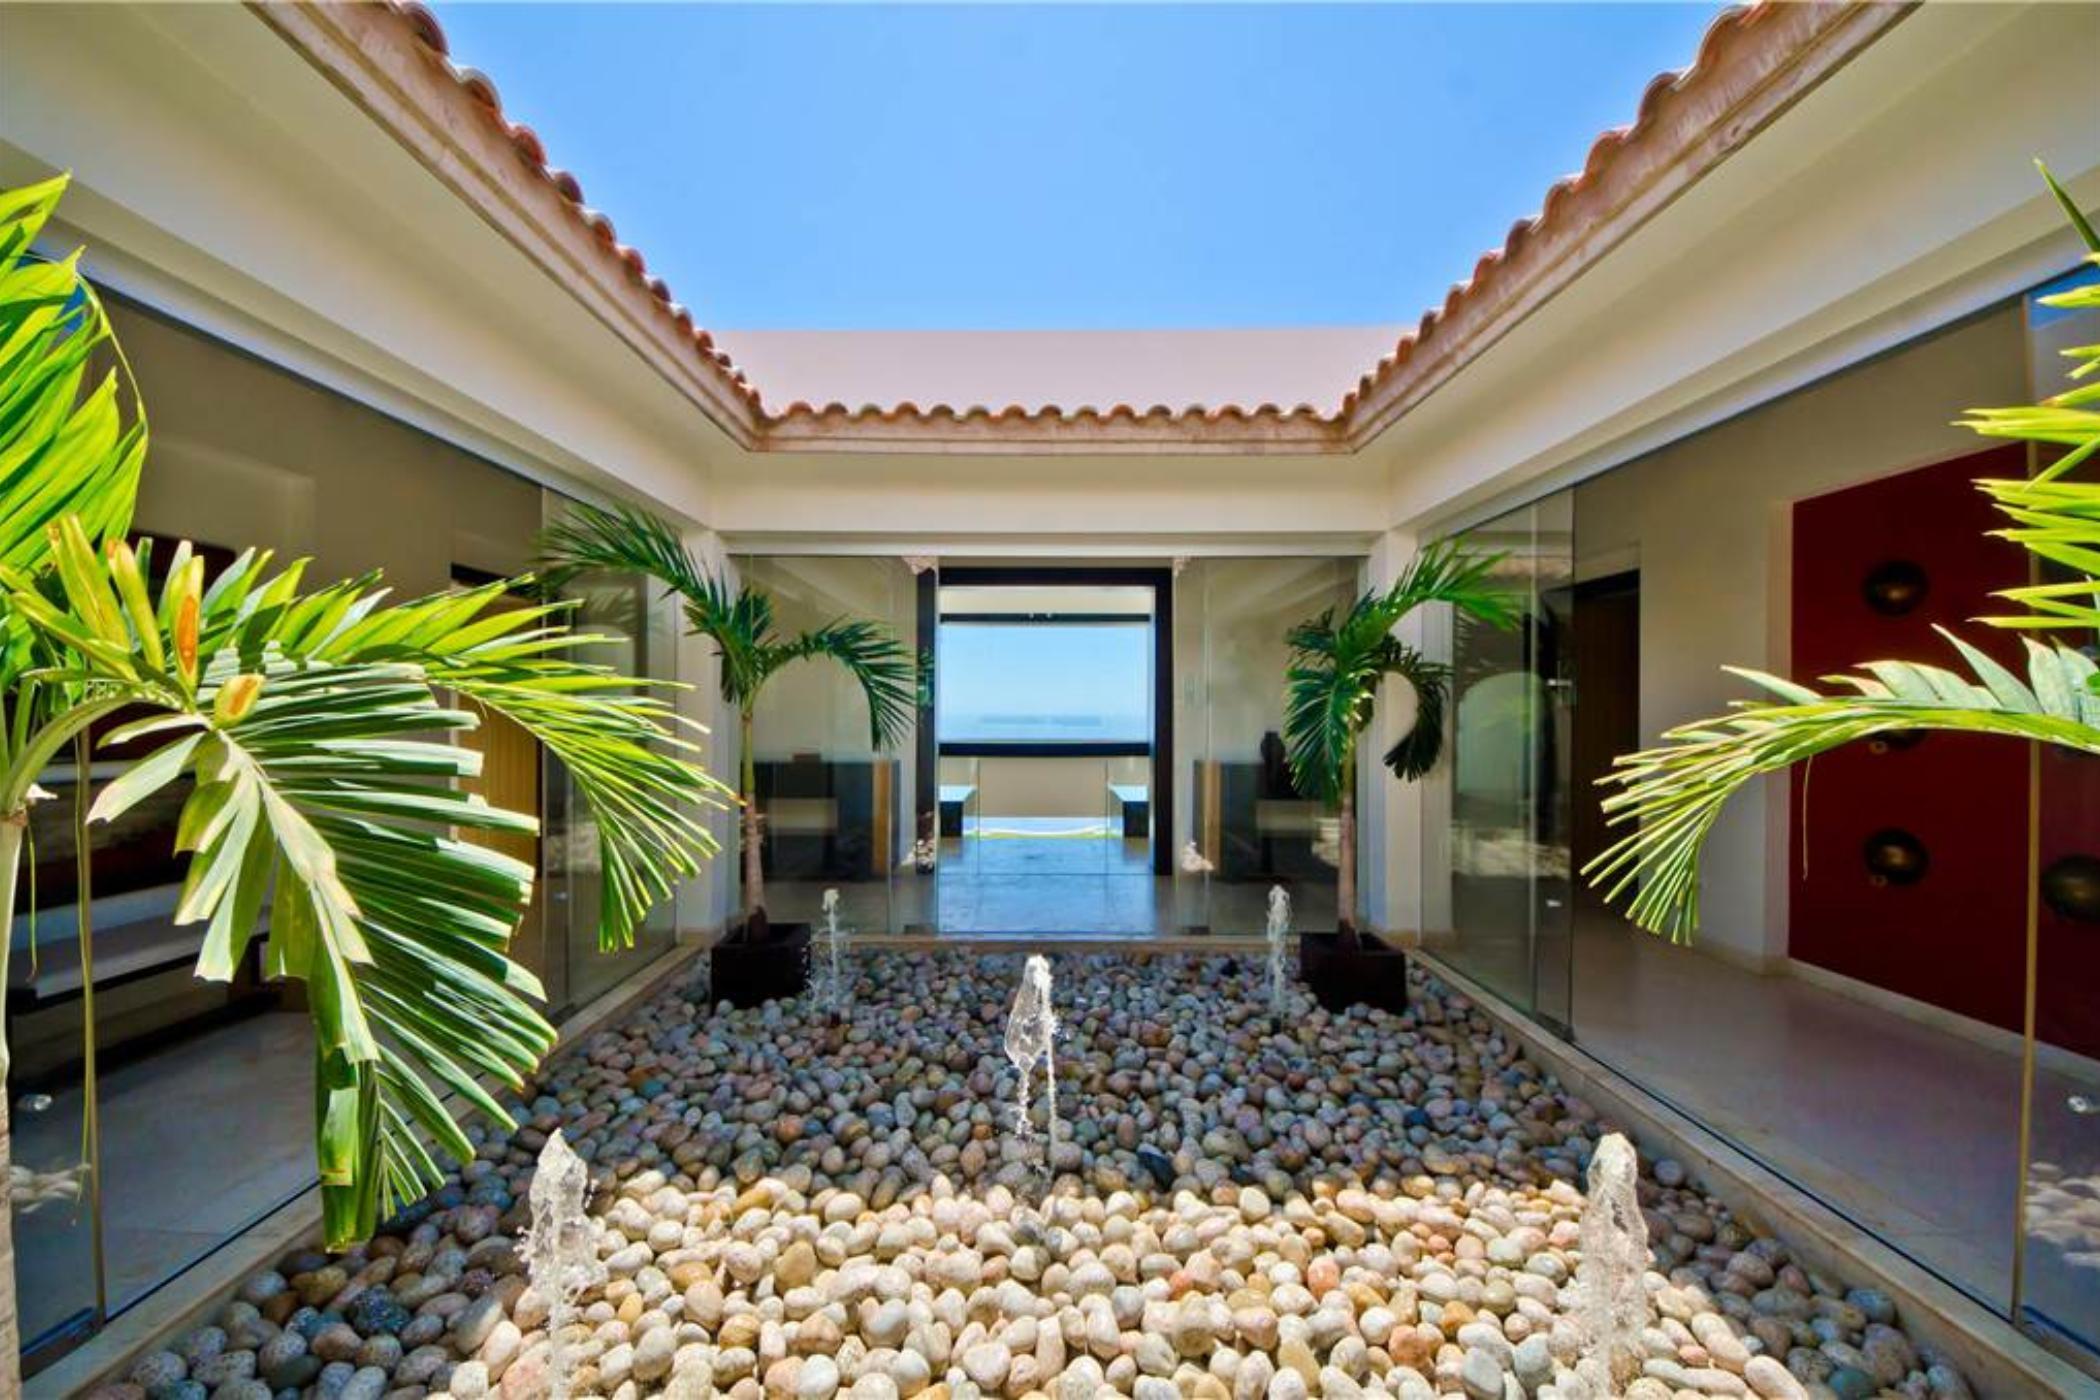 Villa Mestre at Pueblo Bonito Sunset Beach